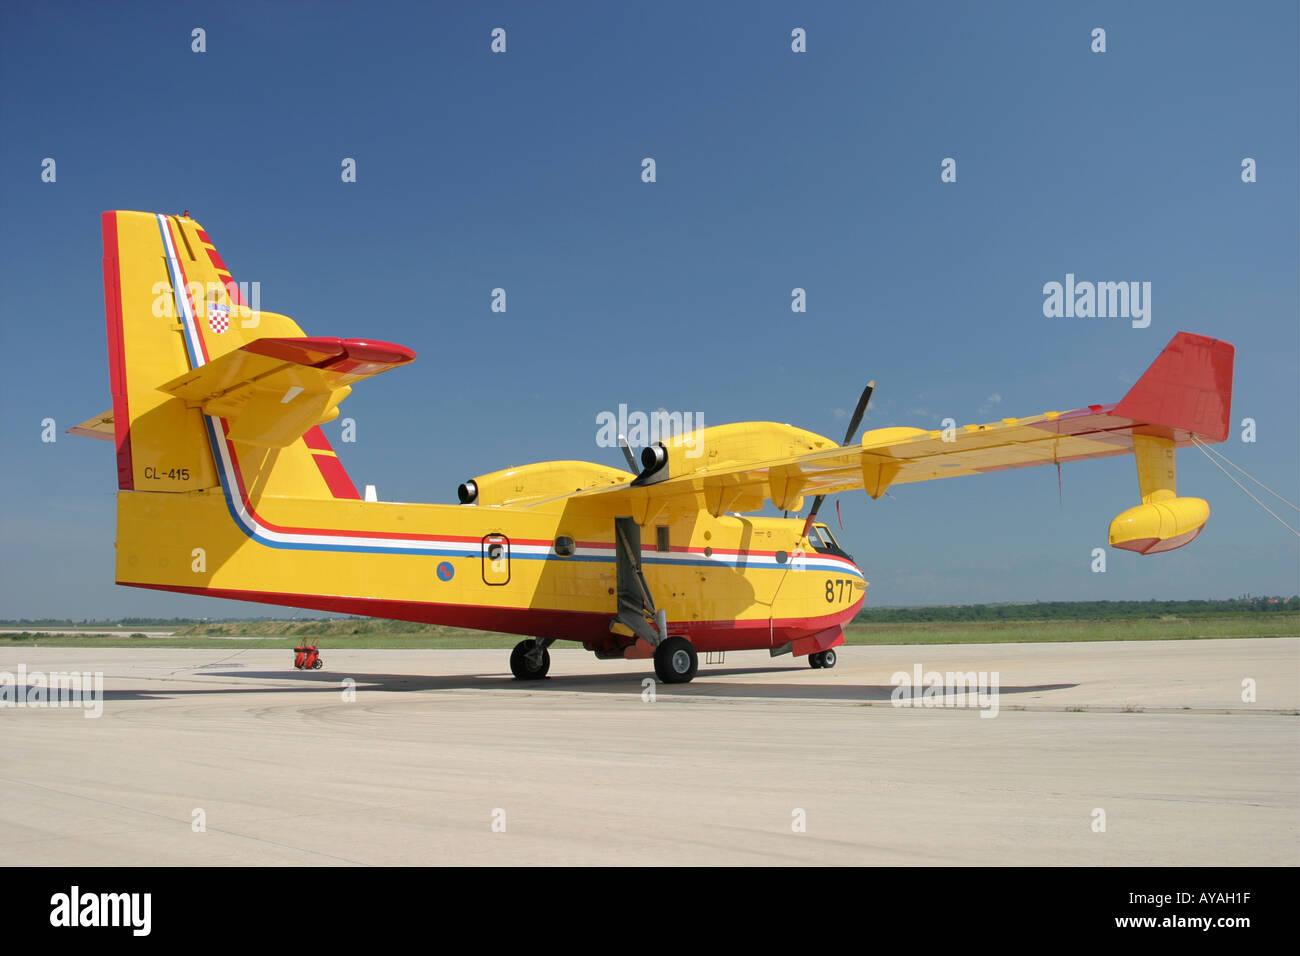 Canadair CL-415 '877' water bomber Croatian Air Force - Stock Image